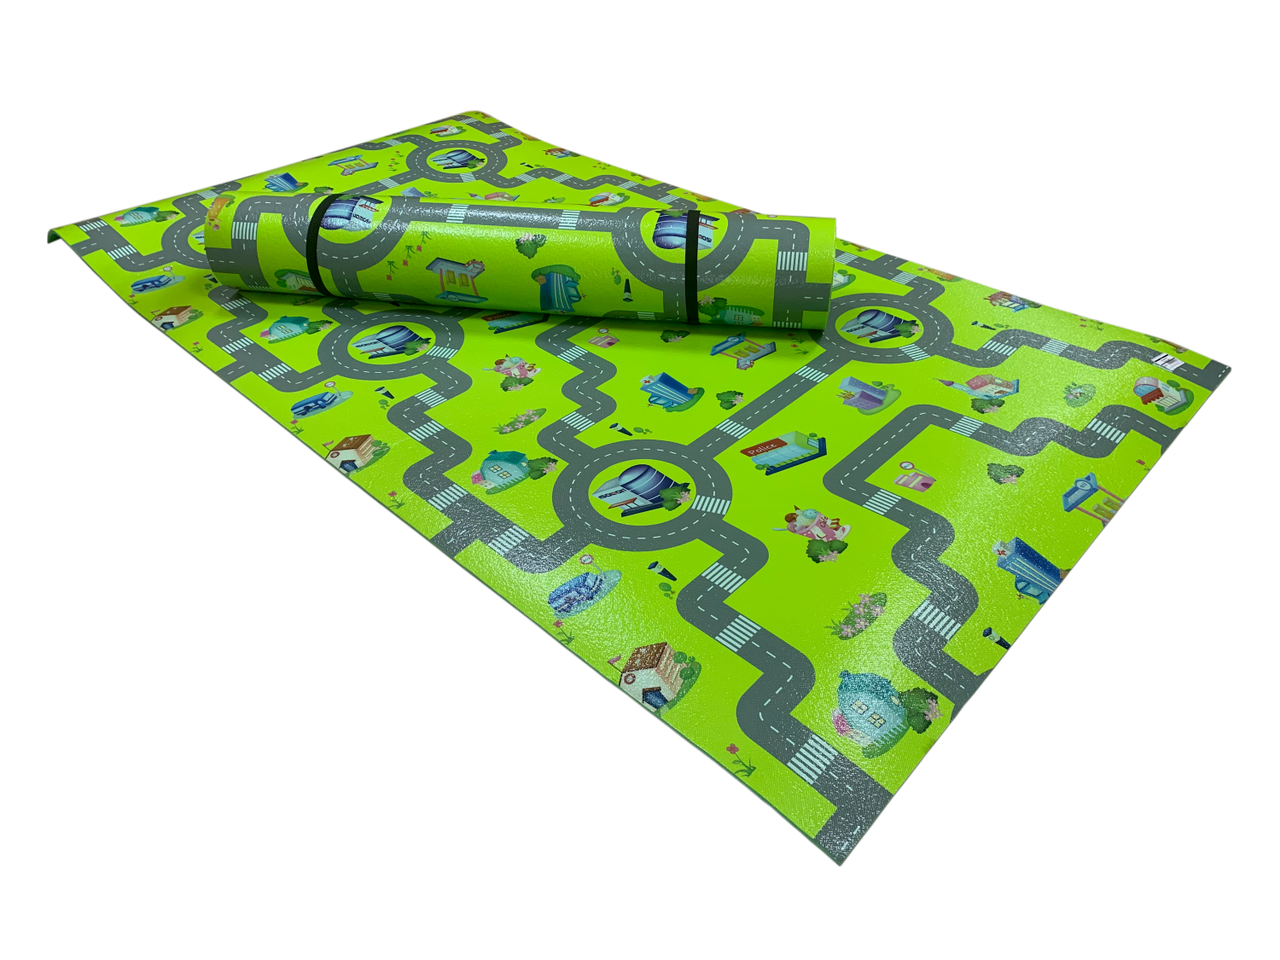 Развивающий коврик Детство 2000*1100*8 см